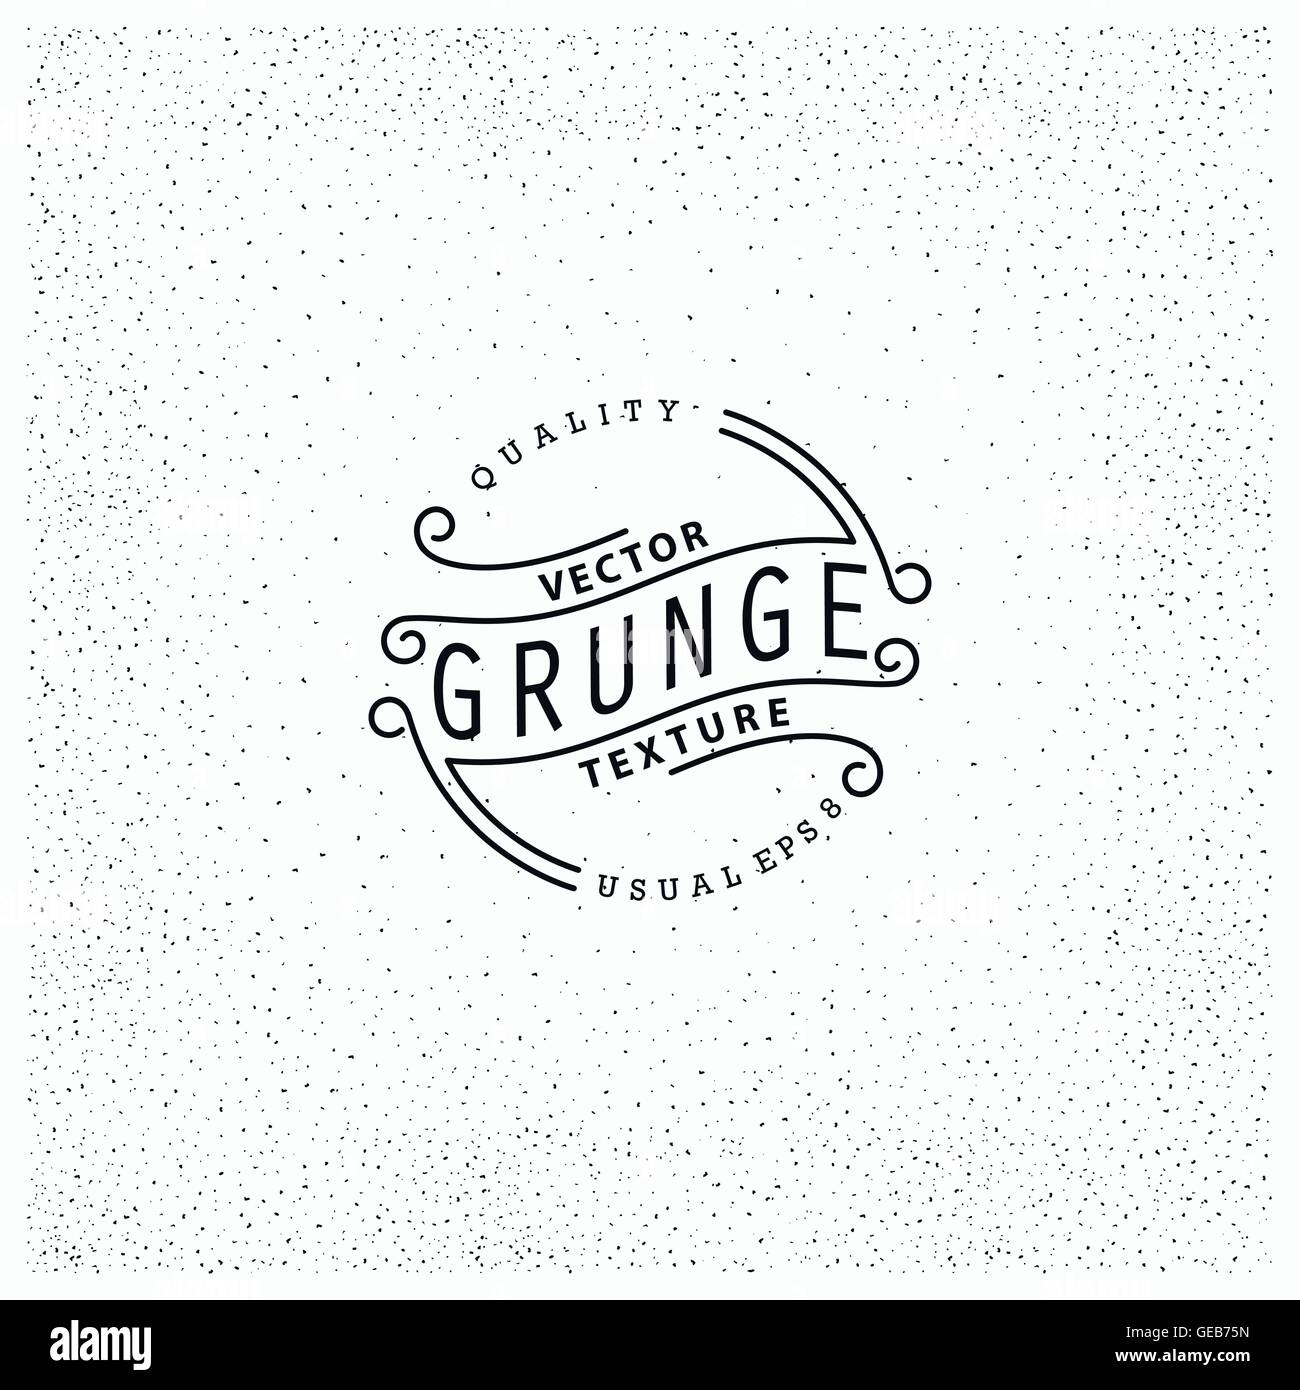 Grunge texture - Stock Image